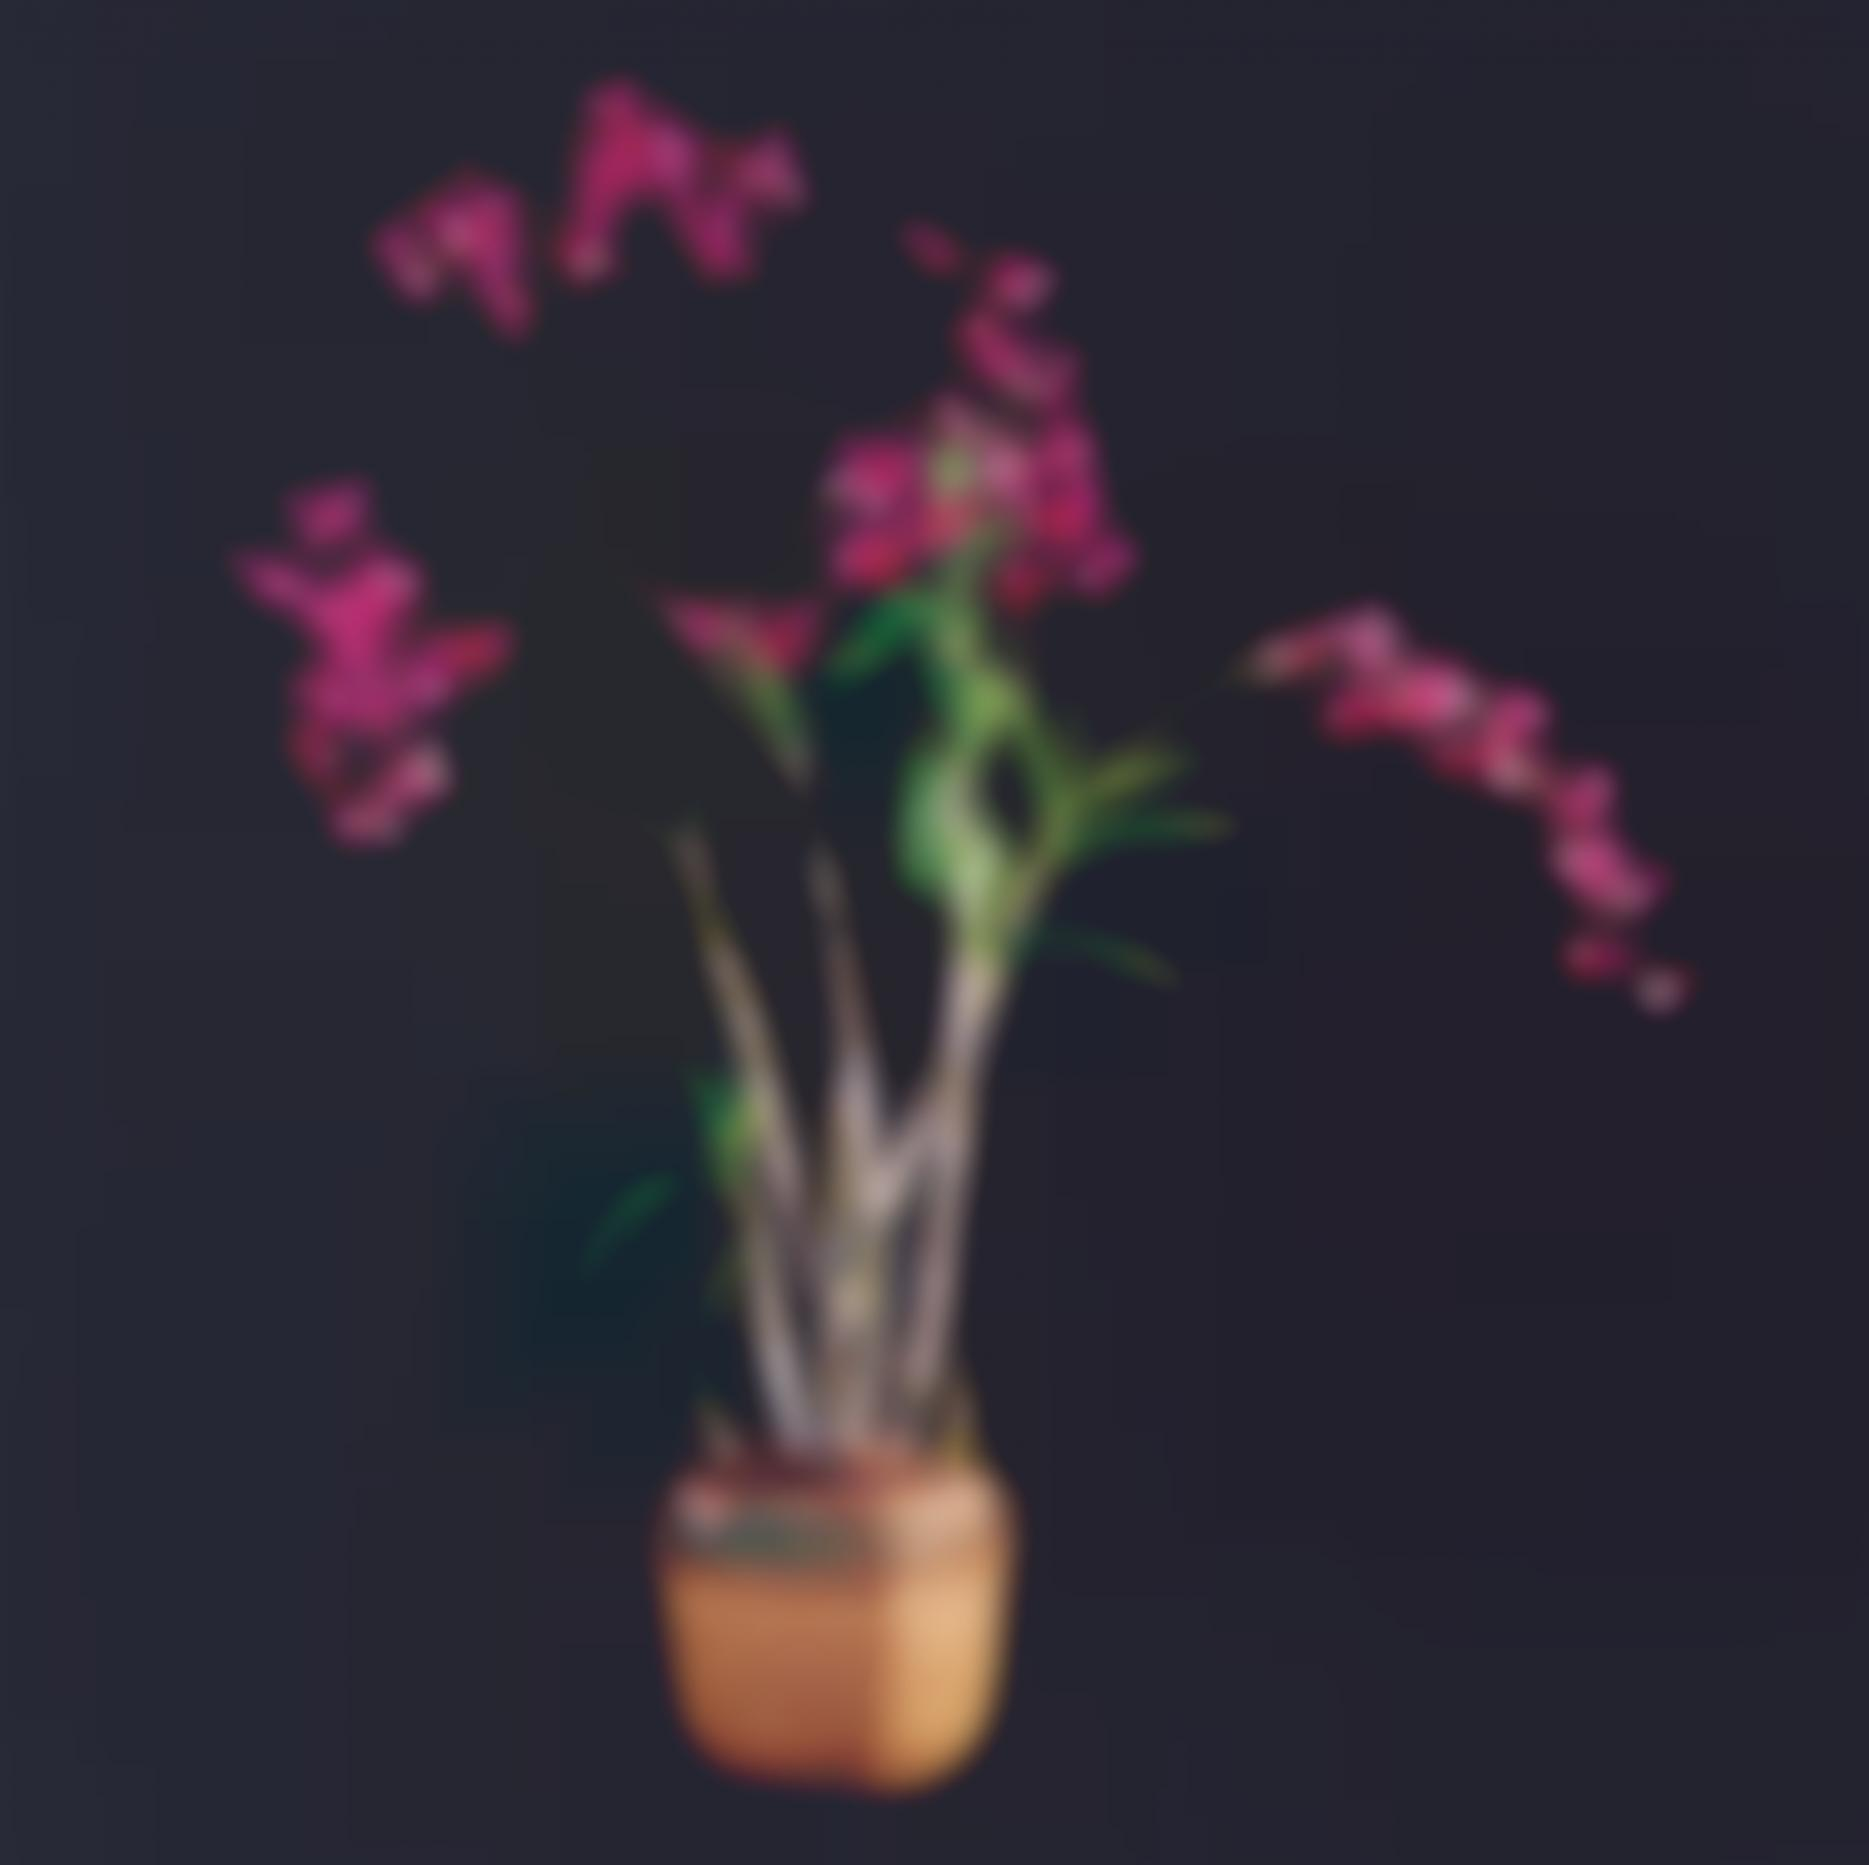 Robert Mapplethorpe-Orchids-1989